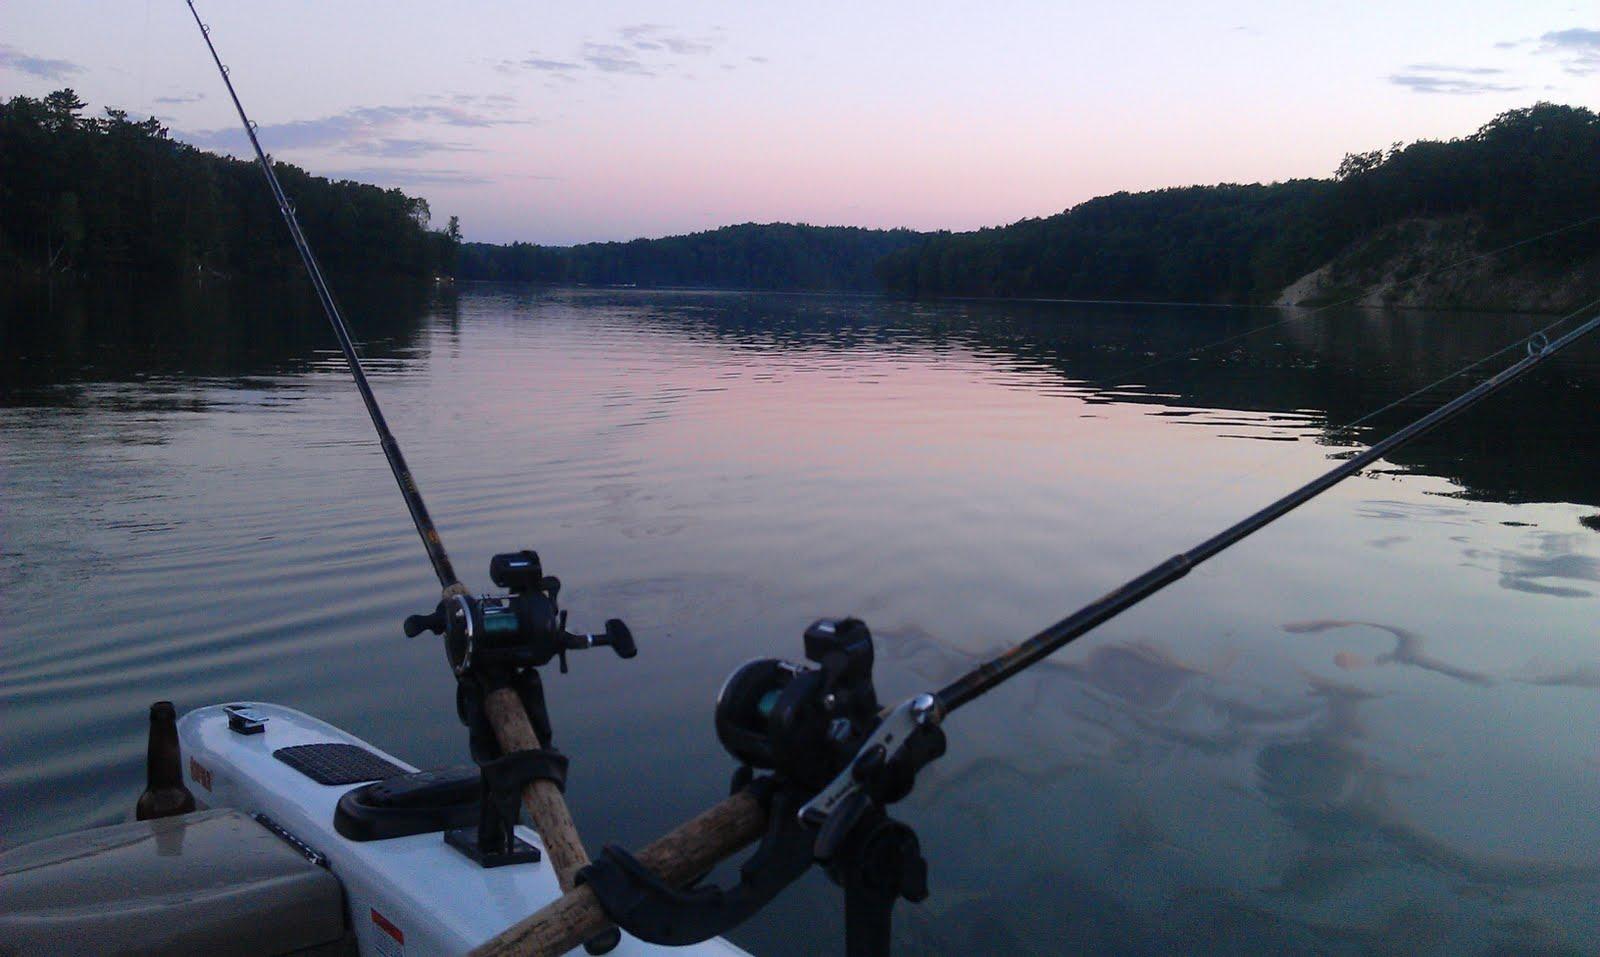 Houghton lake walleye report tippy dam pond 7 16 11 for Tippy dam fishing